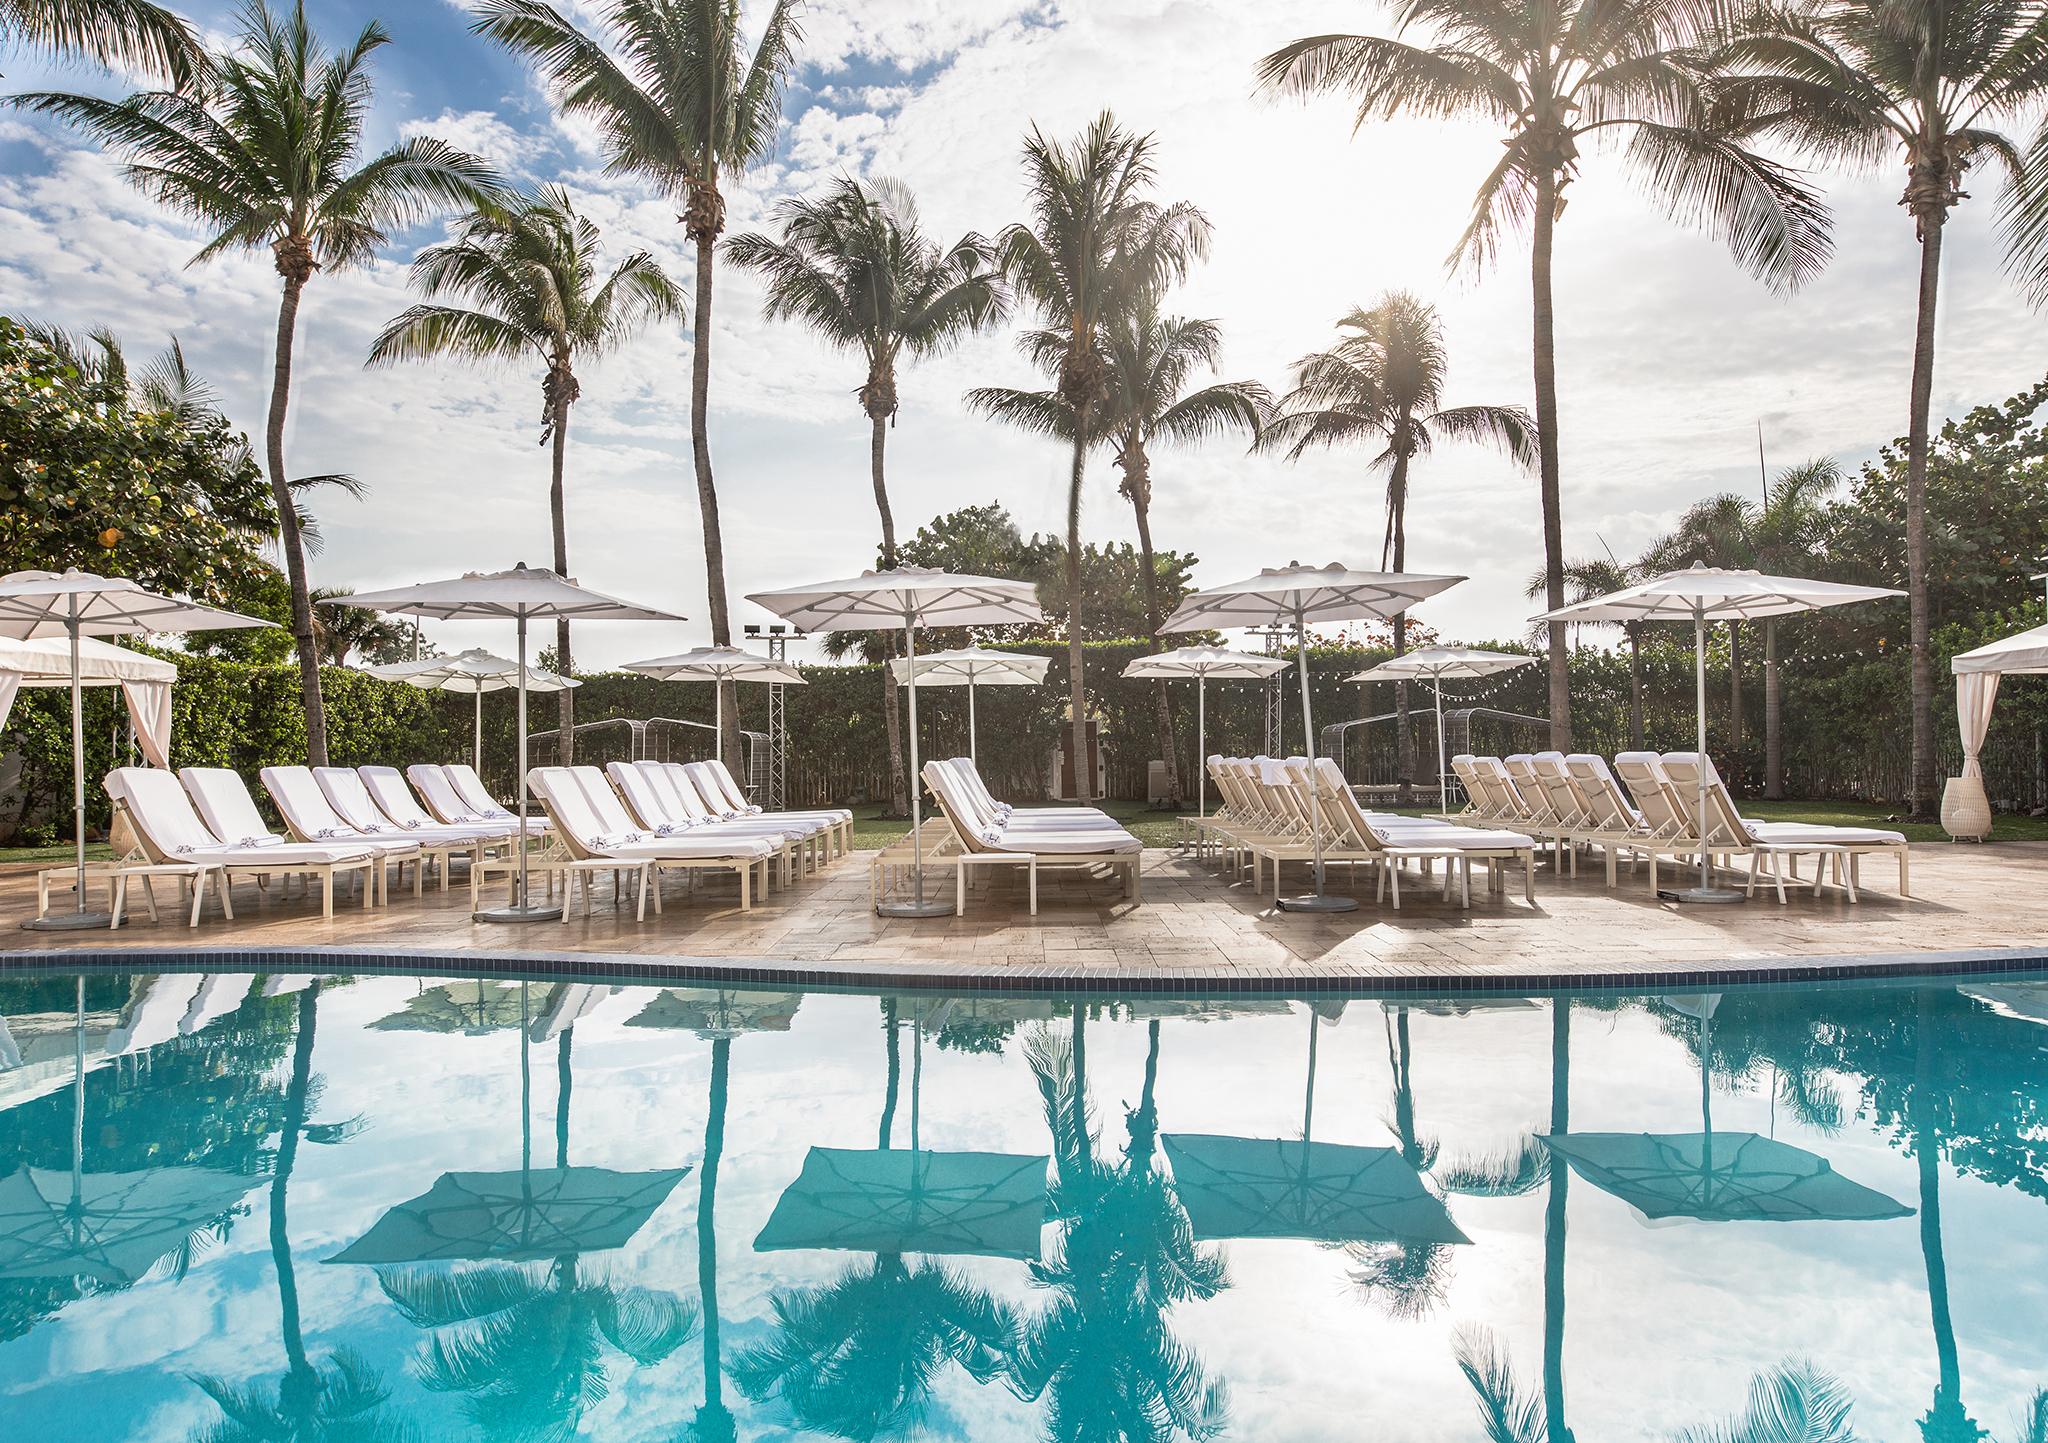 Hilton Bentley Miami South Beach Hotel Room 7